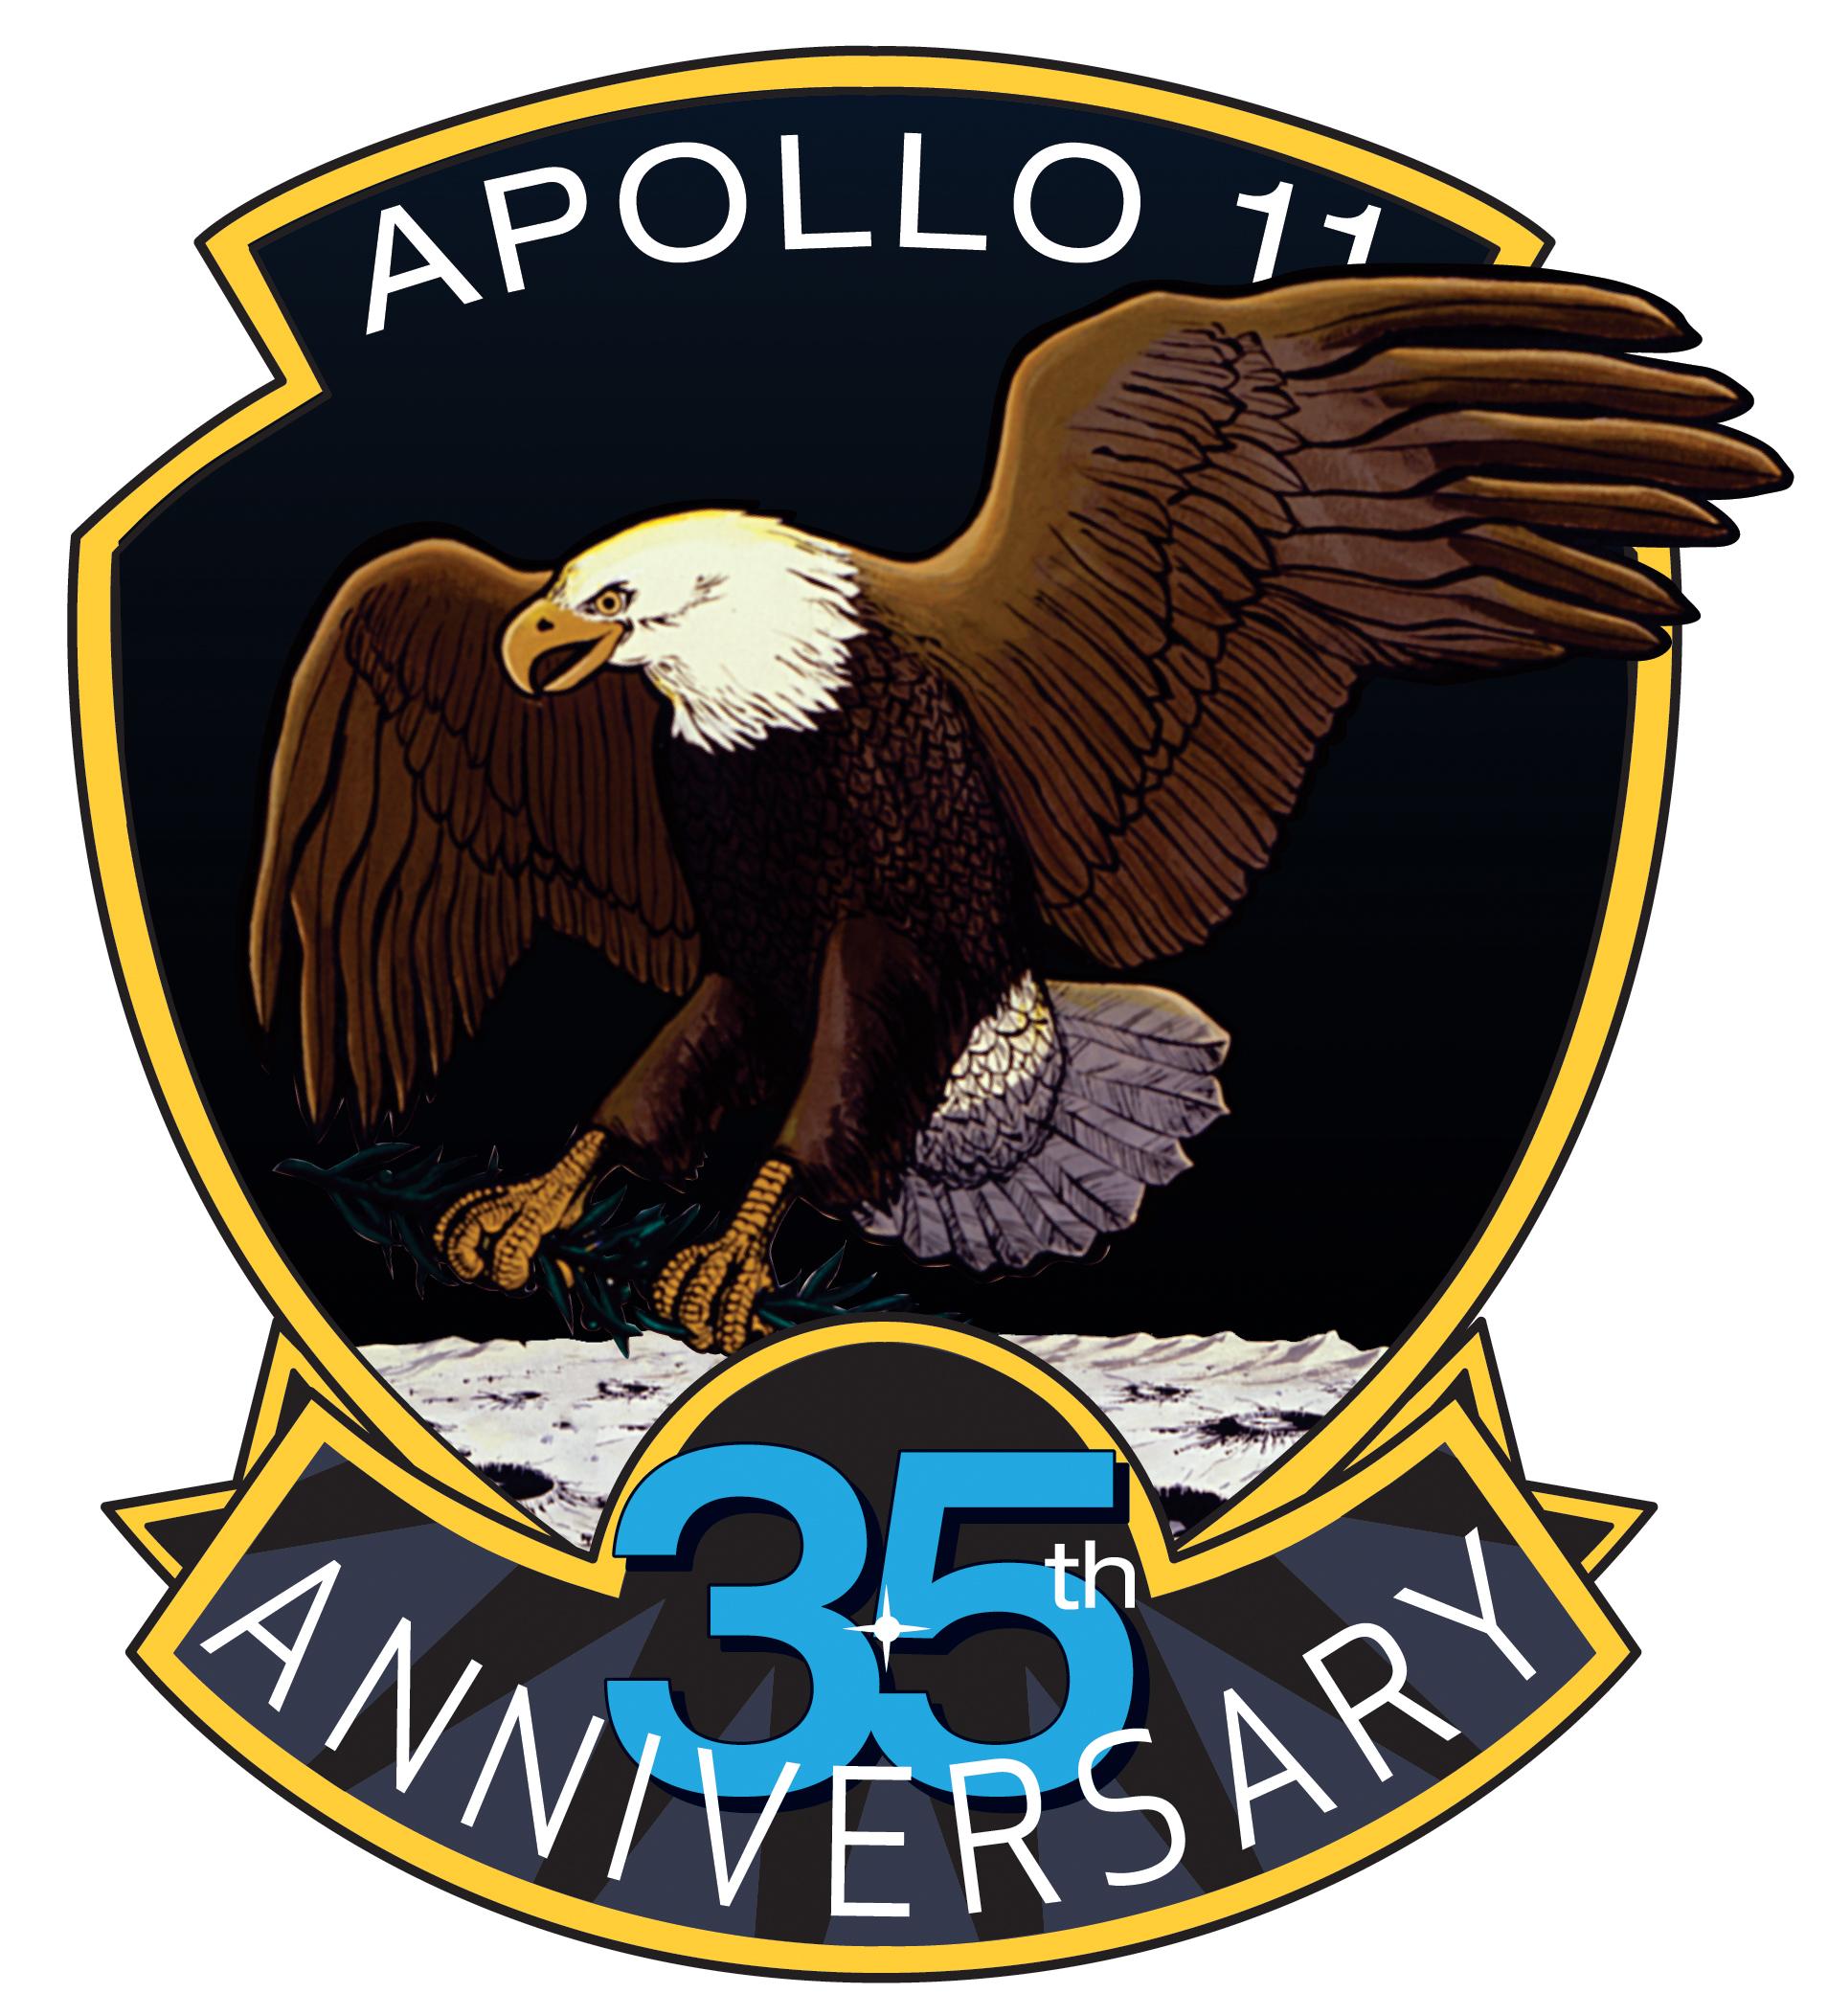 apollo 11 spacecraft names - photo #36